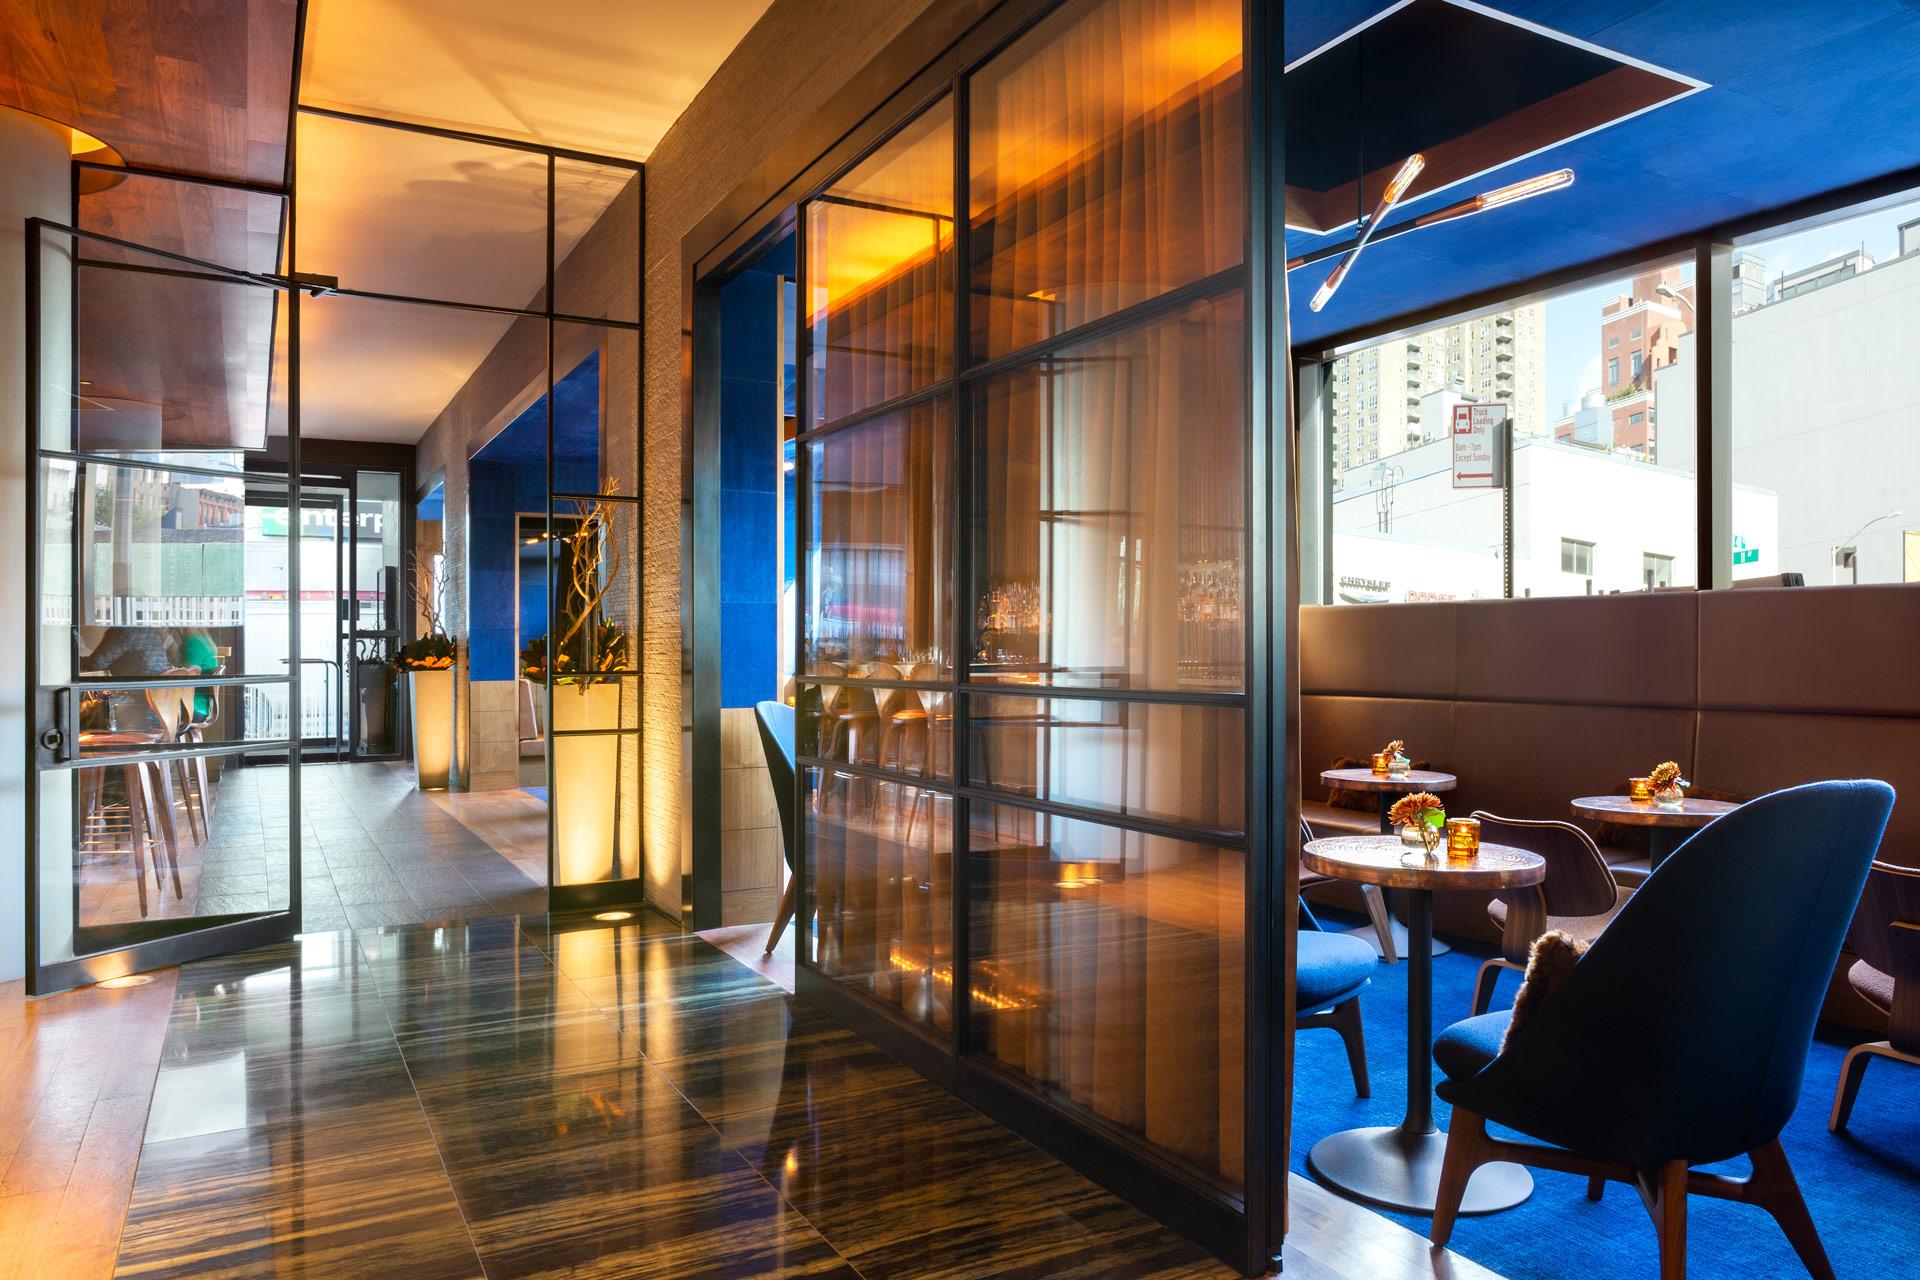 Print Lounge restaurant